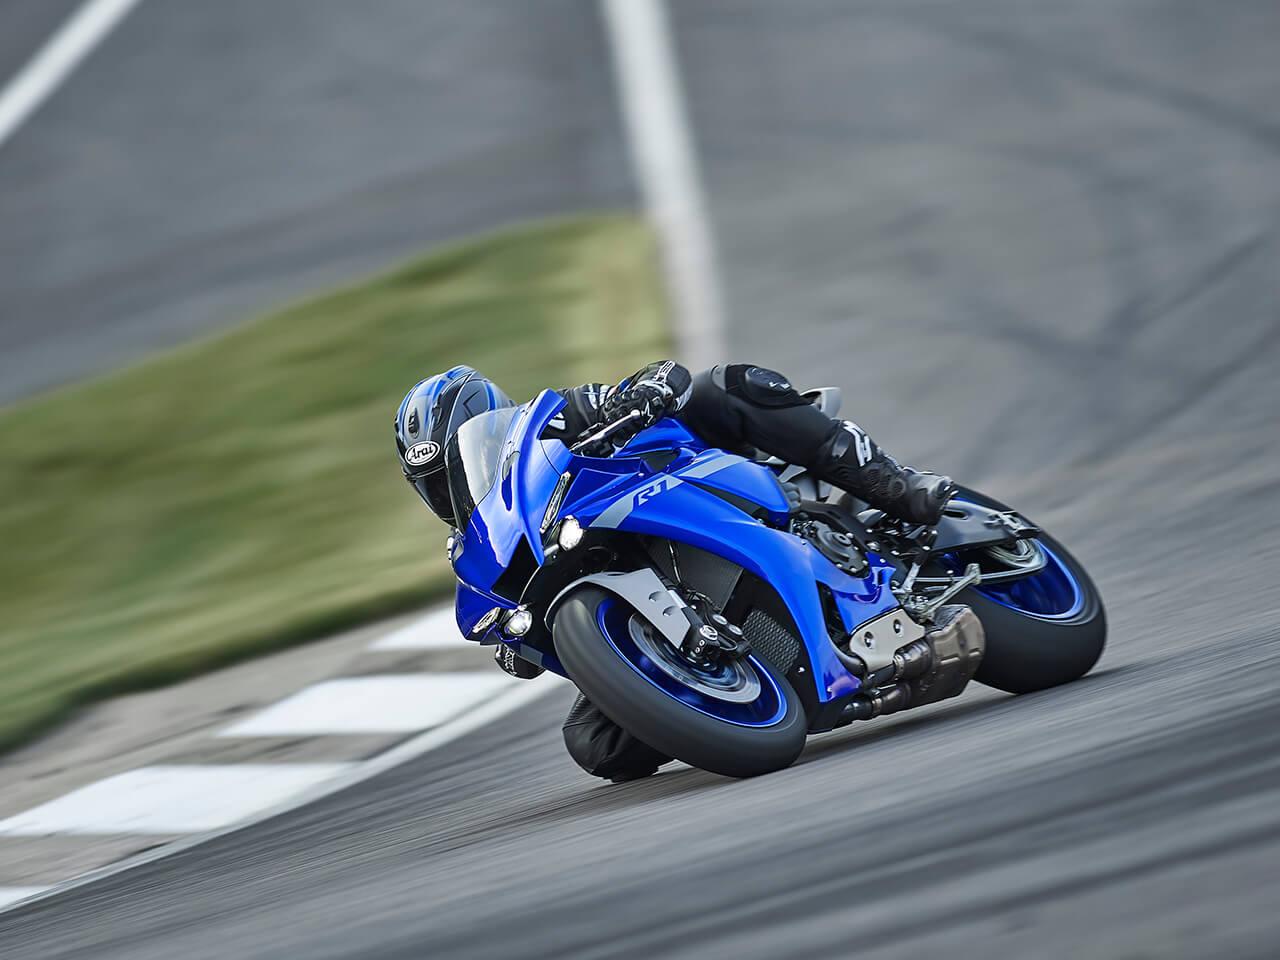 2020 Yamaha YZF-R1 Gallery 5